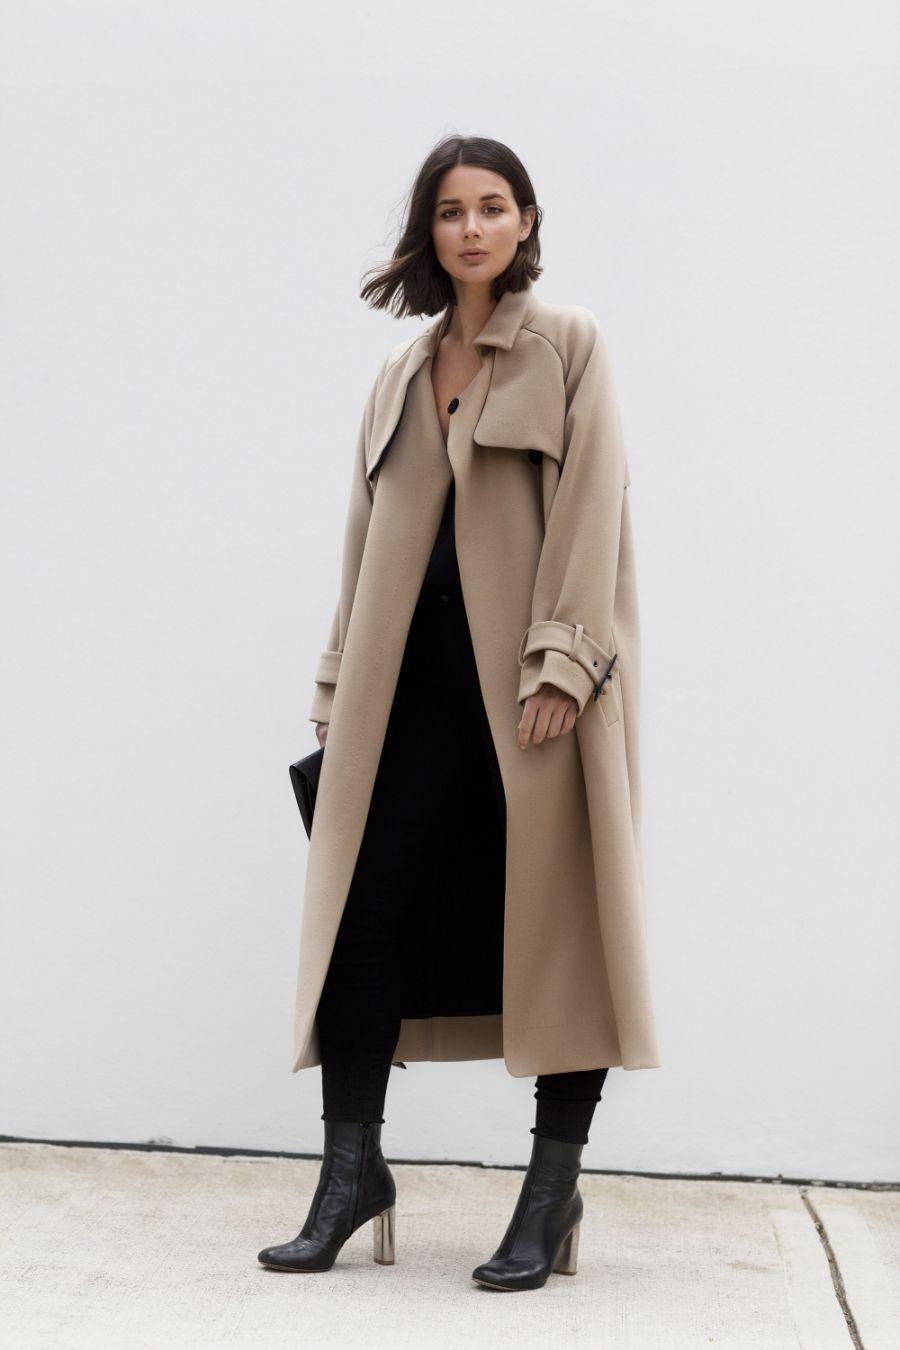 Sara Donaldson Minimalist Fashion Style Minimalist Fashion Neutral Winter Dresses And Minimalist